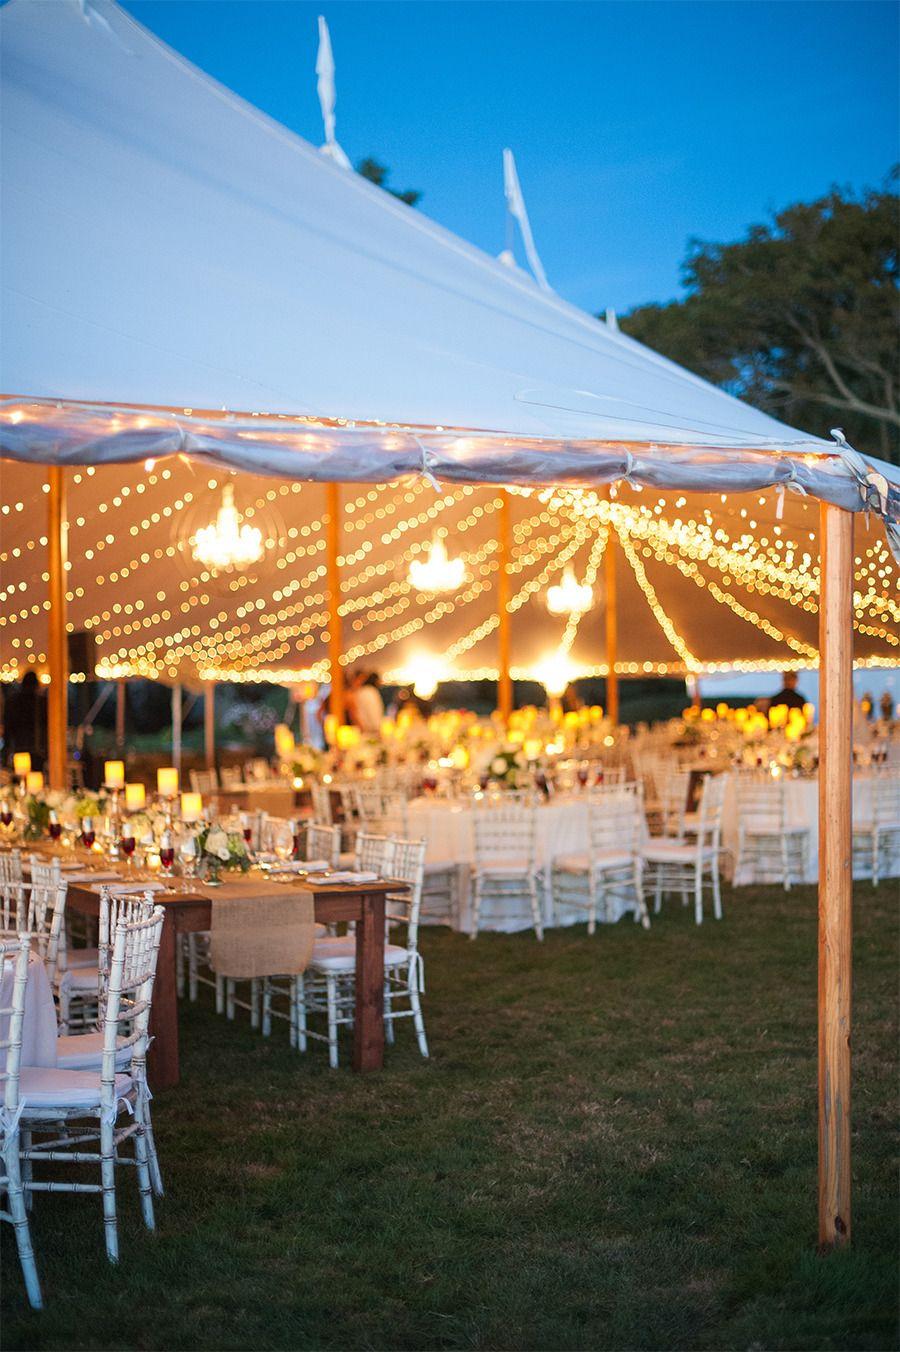 Elegant Newport Estate Wedding. White Tent ... & Elegant Newport Estate Wedding | Newport Wedding and Photography